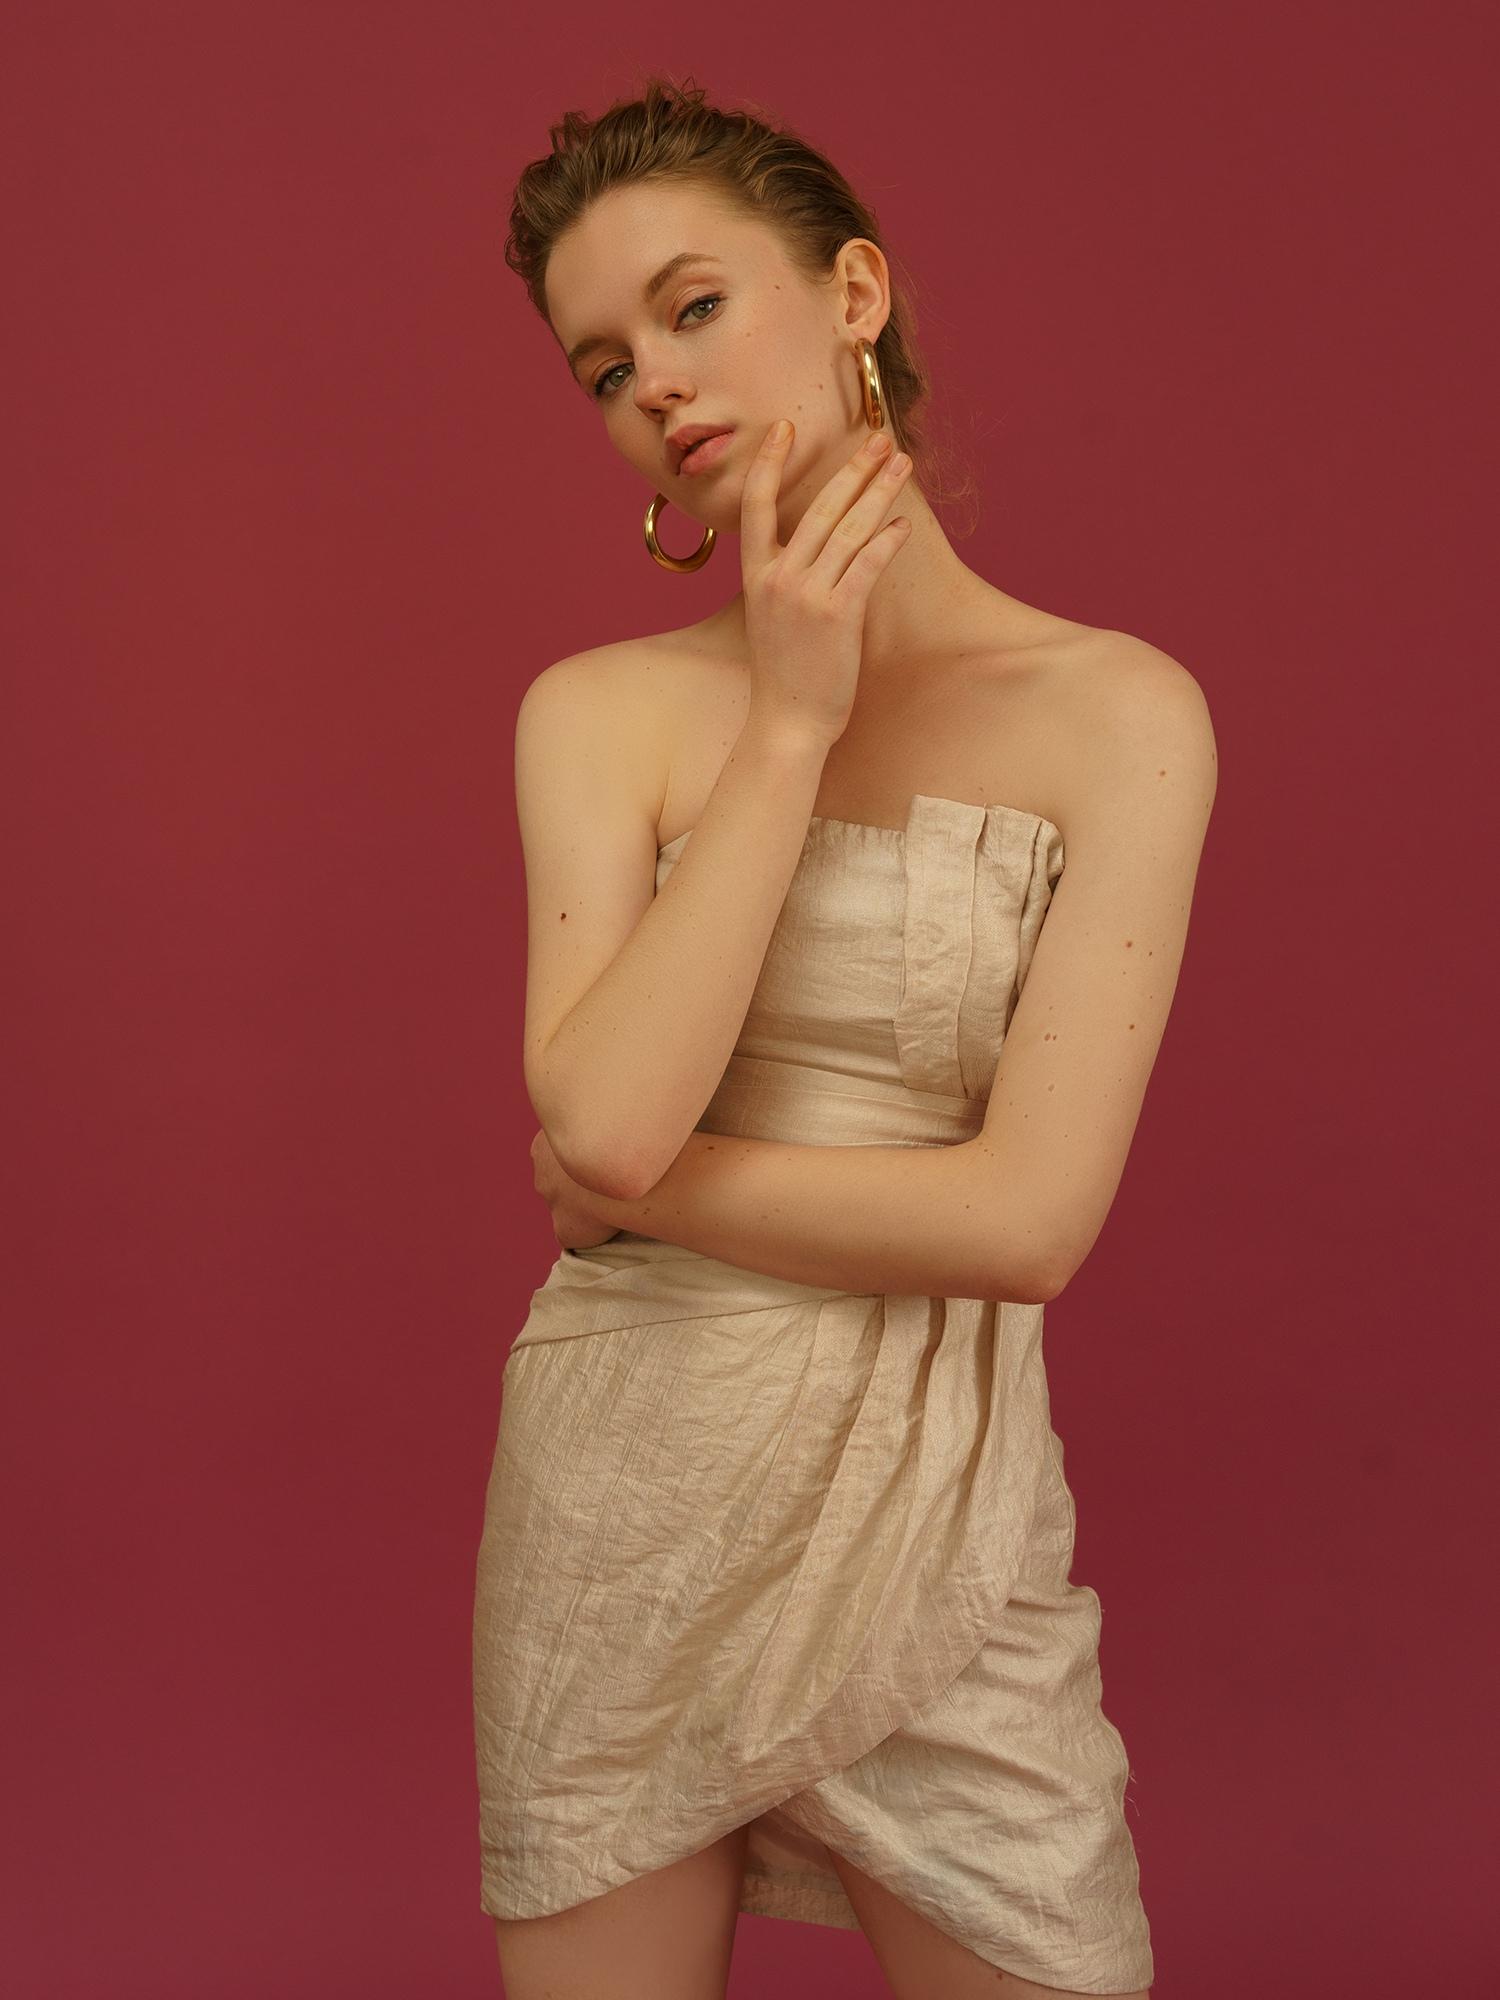 Portraits by Nika Baeva